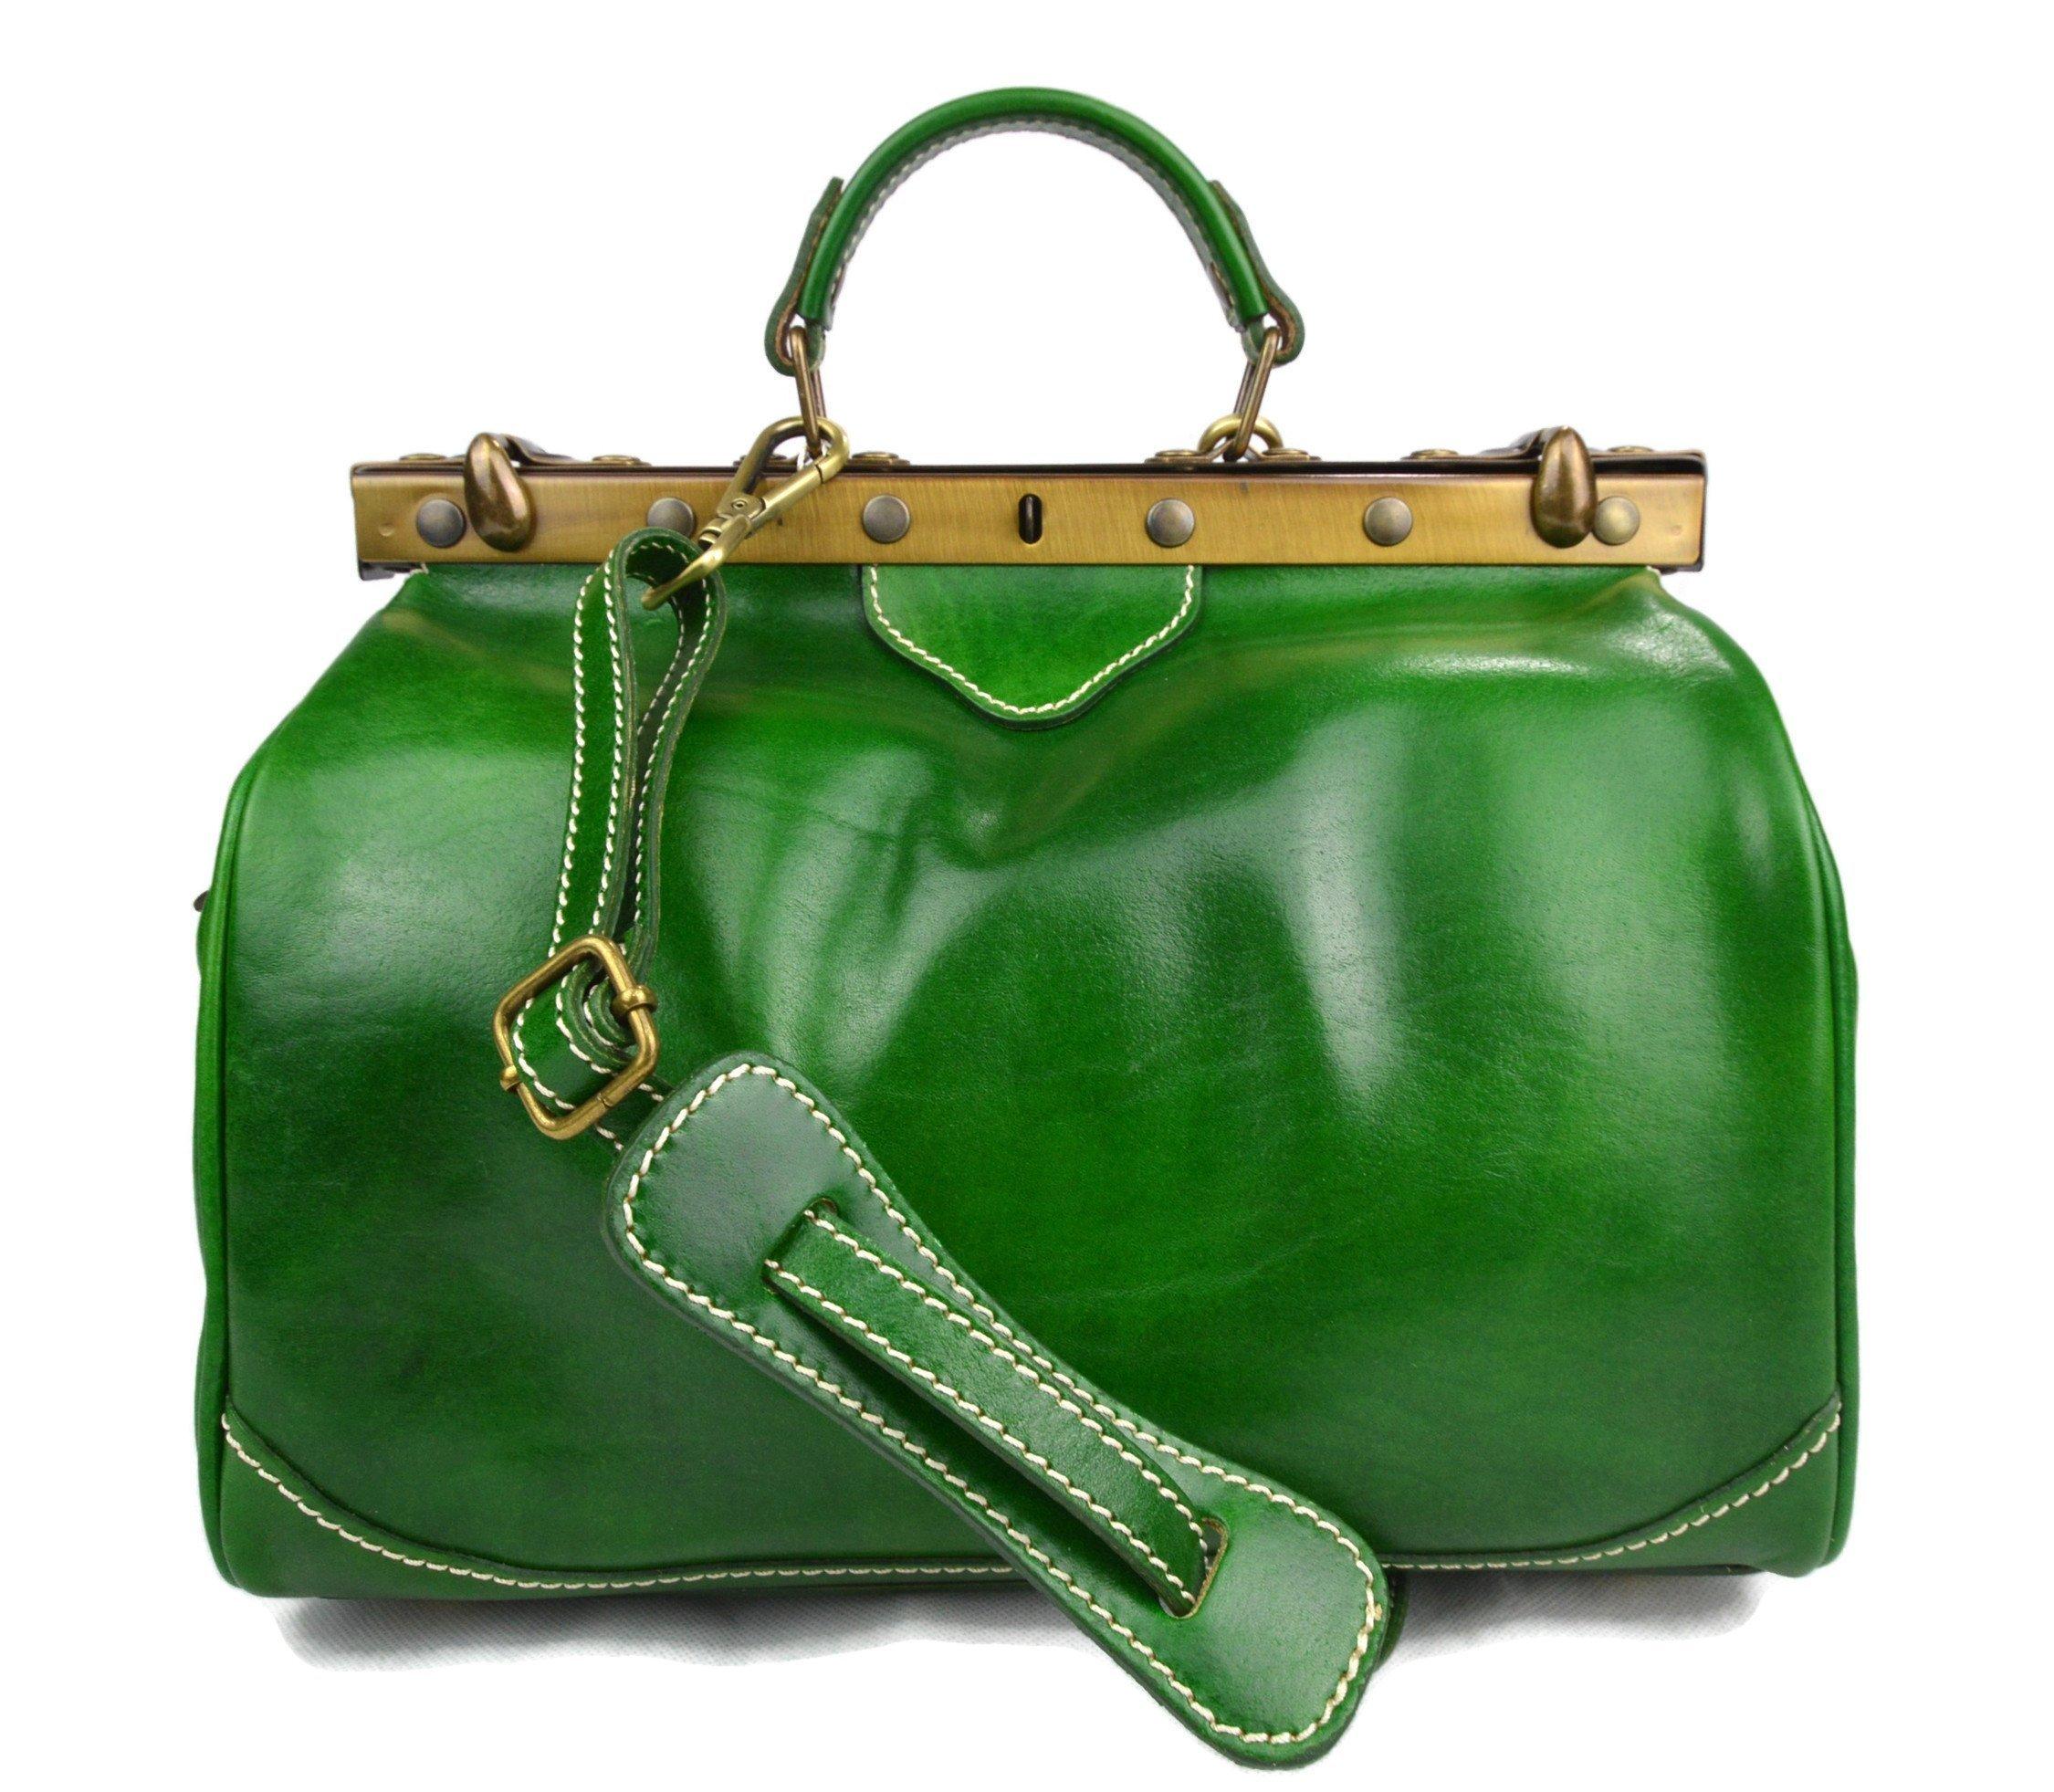 Ladies leather handbag doctor bag handheld shoulder bag medical purse green made in Italy - handmade-bags